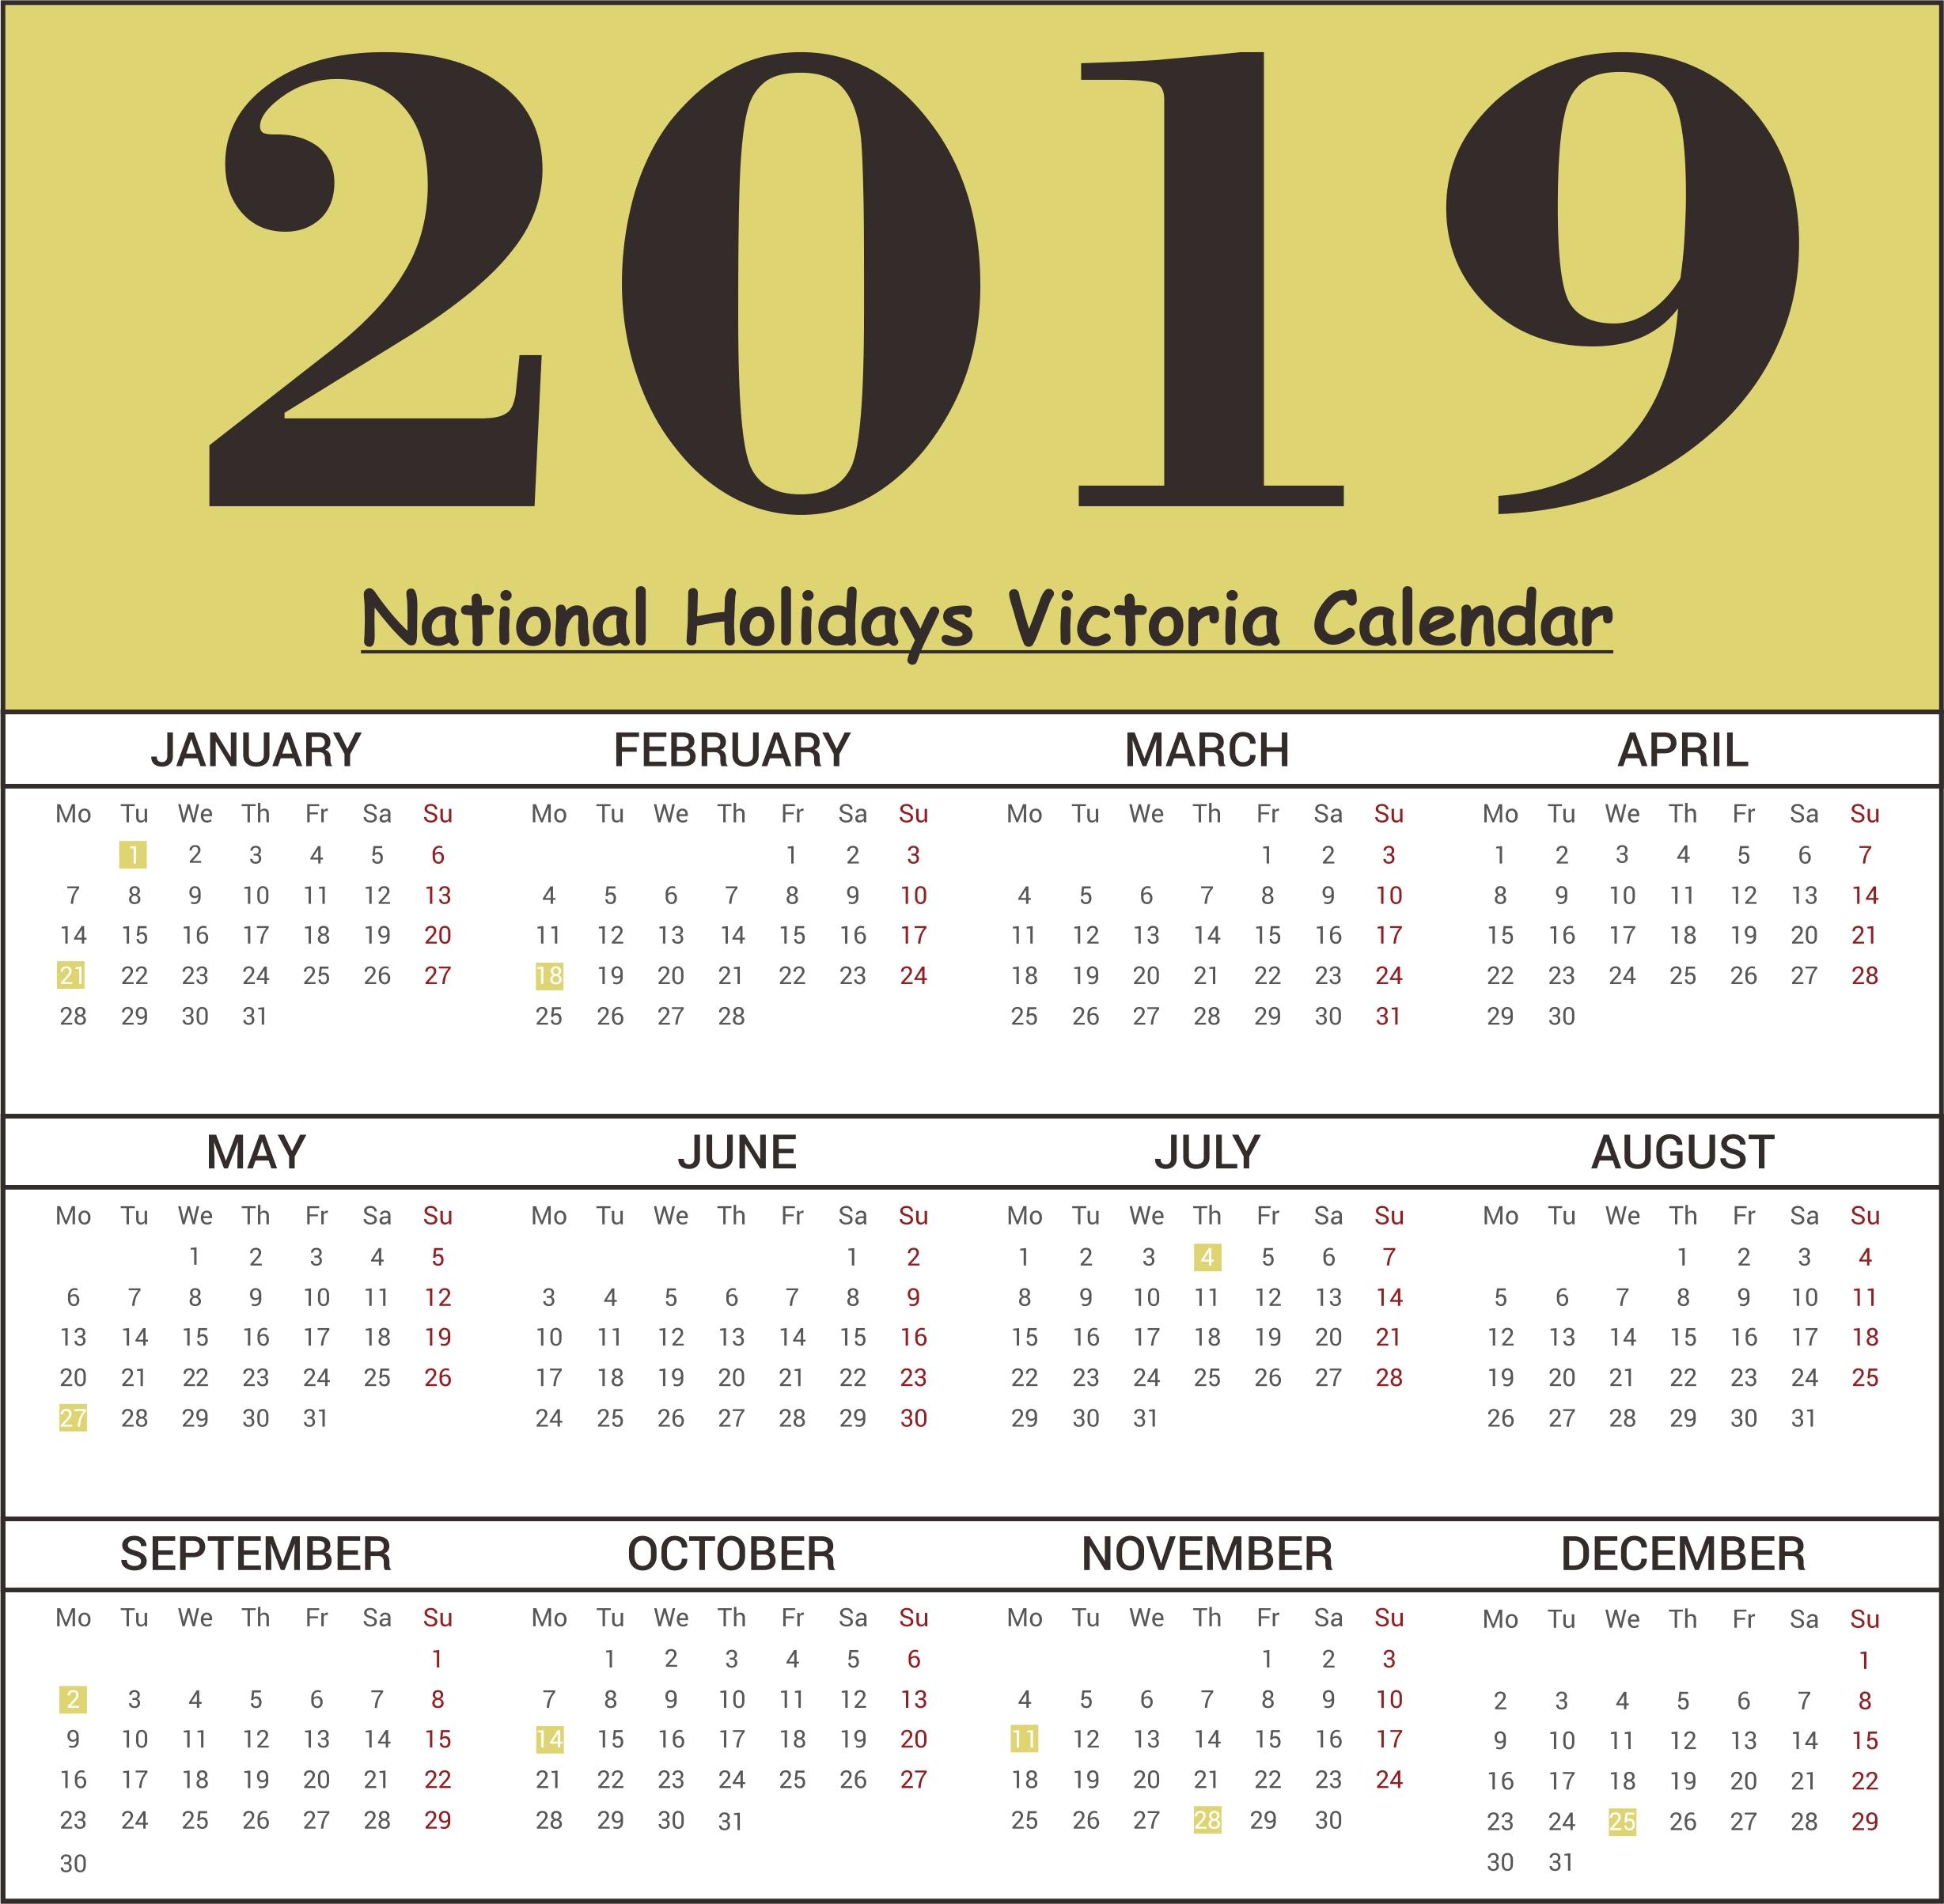 Calendar School Holidays Victoria • Printable Blank Calendar Template Calendar 2019 Victoria School Holidays